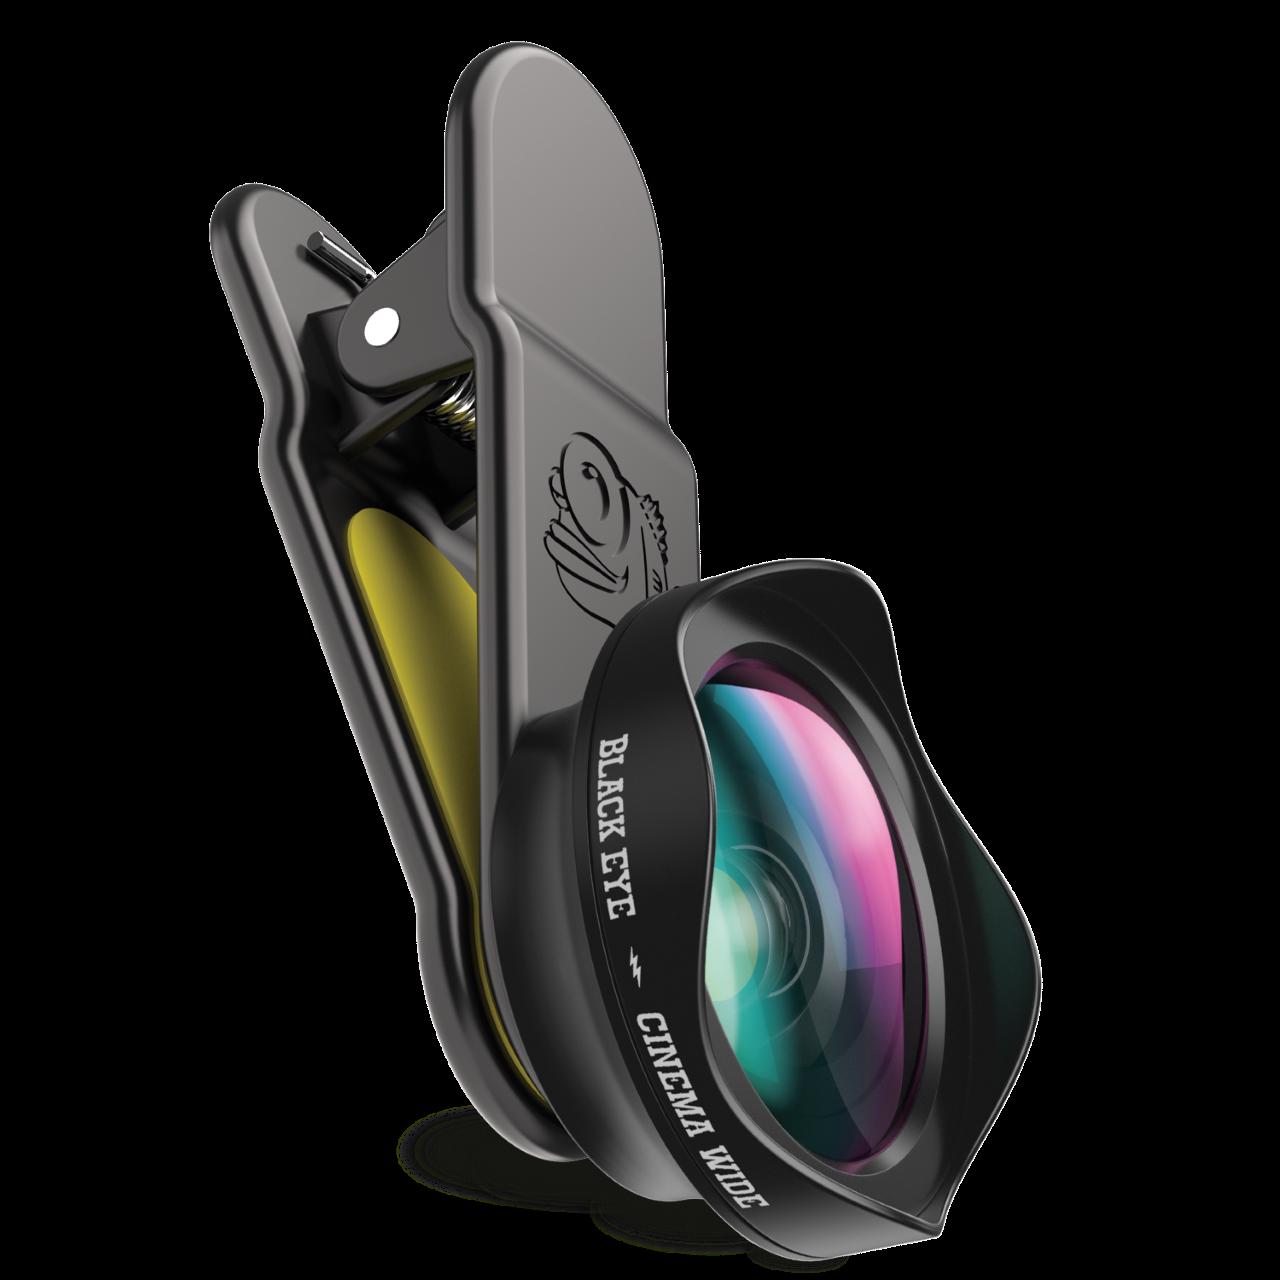 Black Eye Cinema Wide Angle 120° Weitwinkelobjektiv, Smartphone-Objektiv CW001